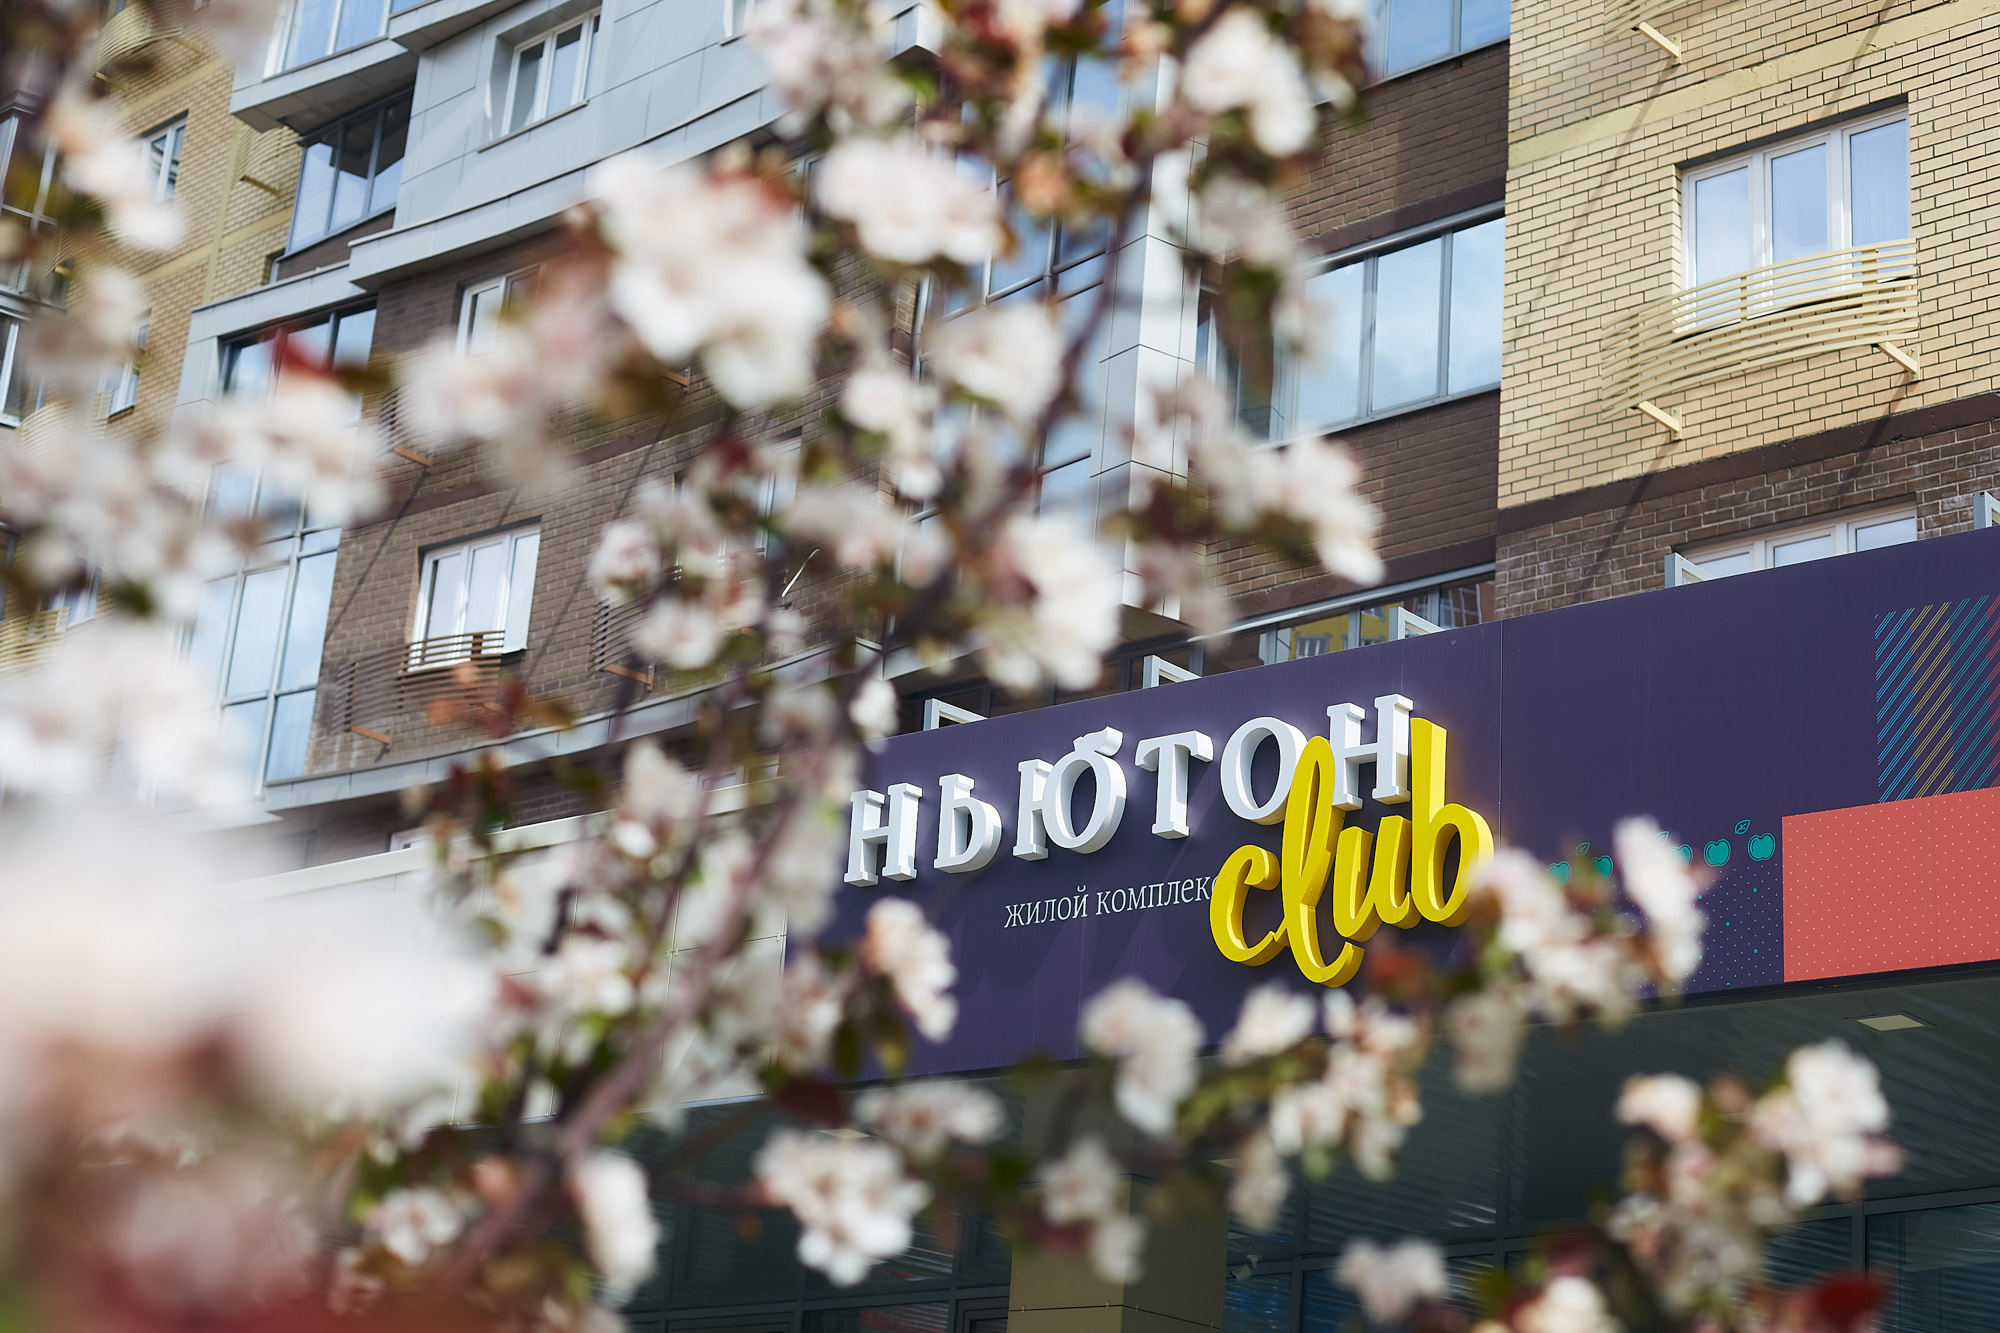 Ньютон клуб москва киев стриптиз бар